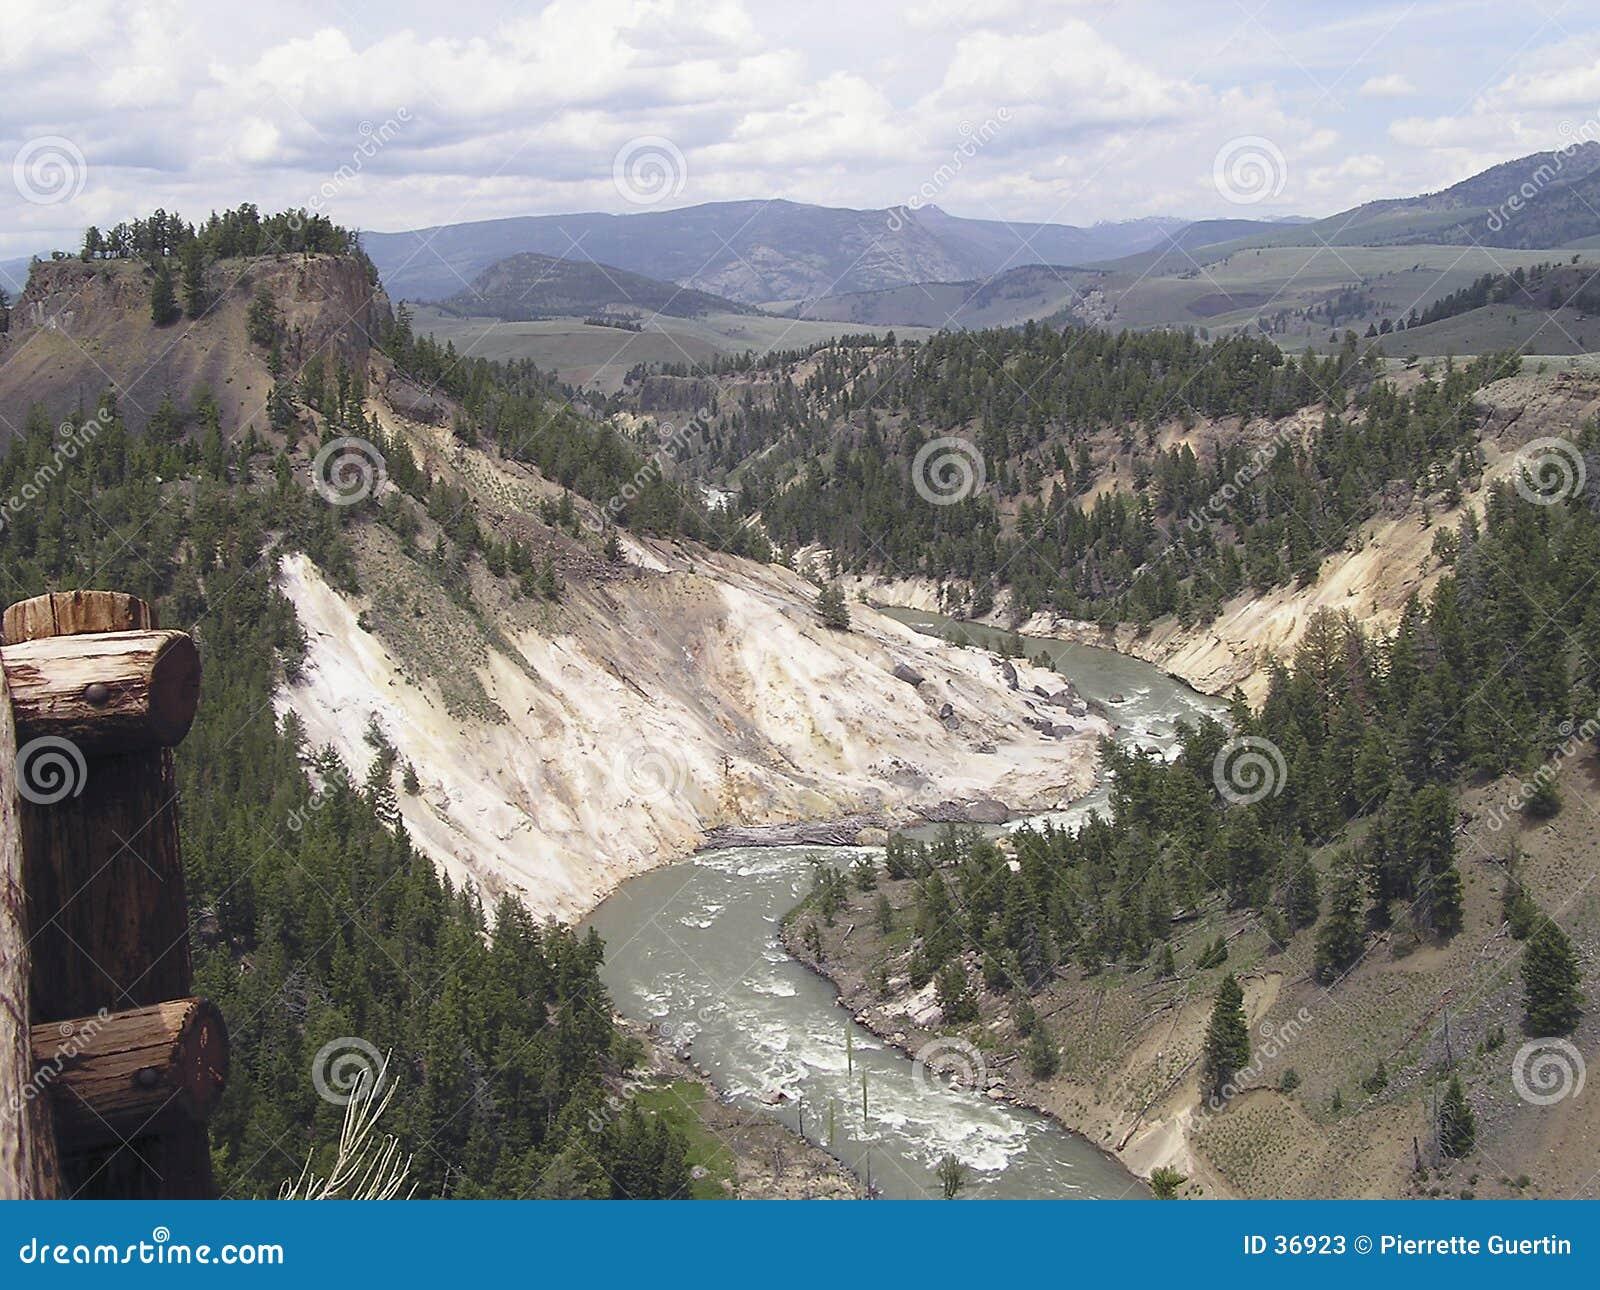 Gorge - Yellowstone